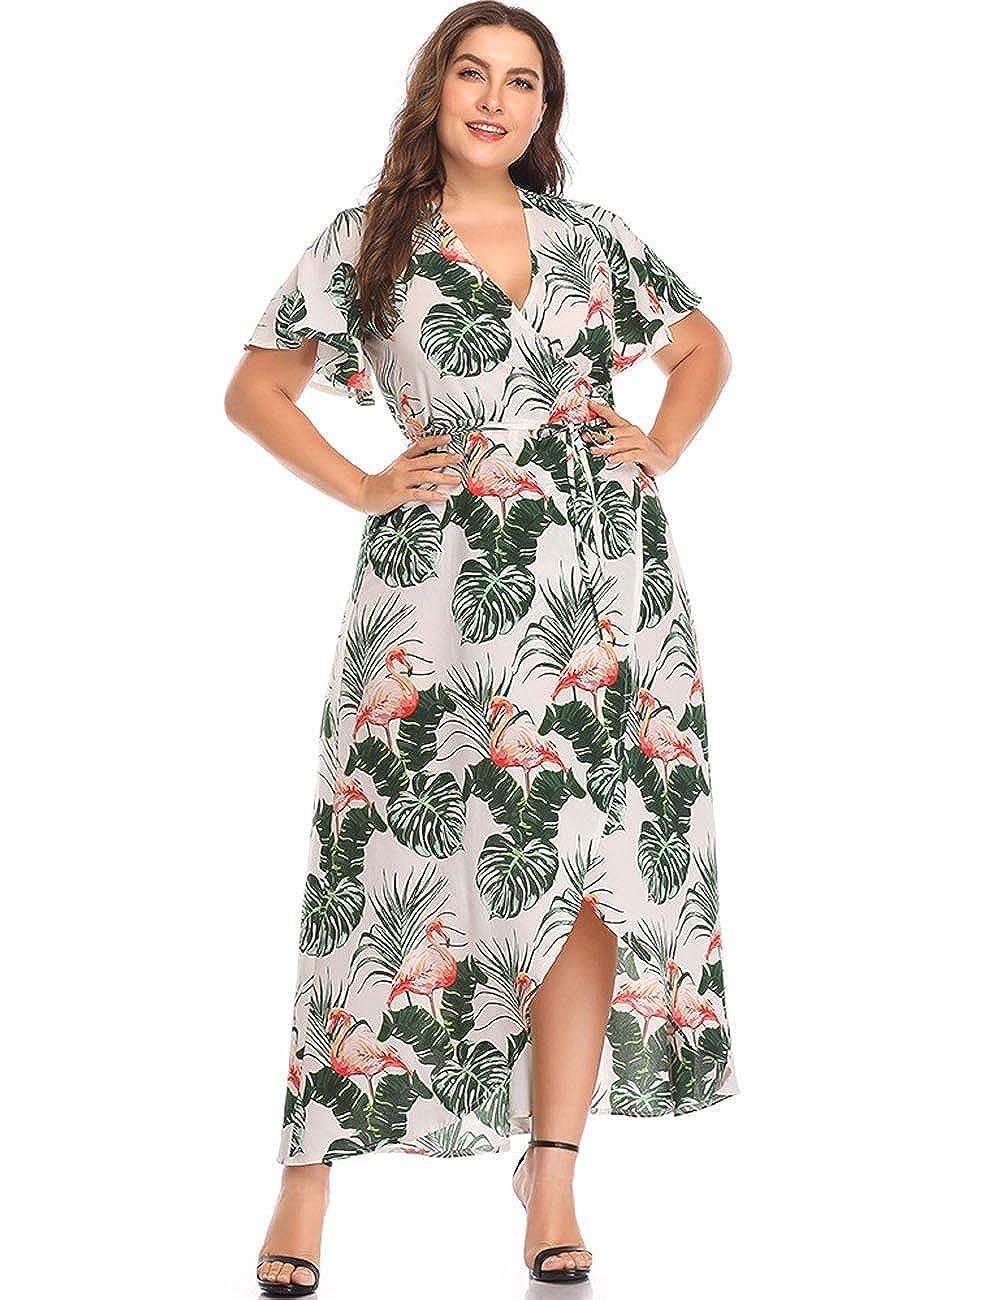 4a0170af87 Top 10 wholesale Long Floral Wrap Dress - Chinabrands.com